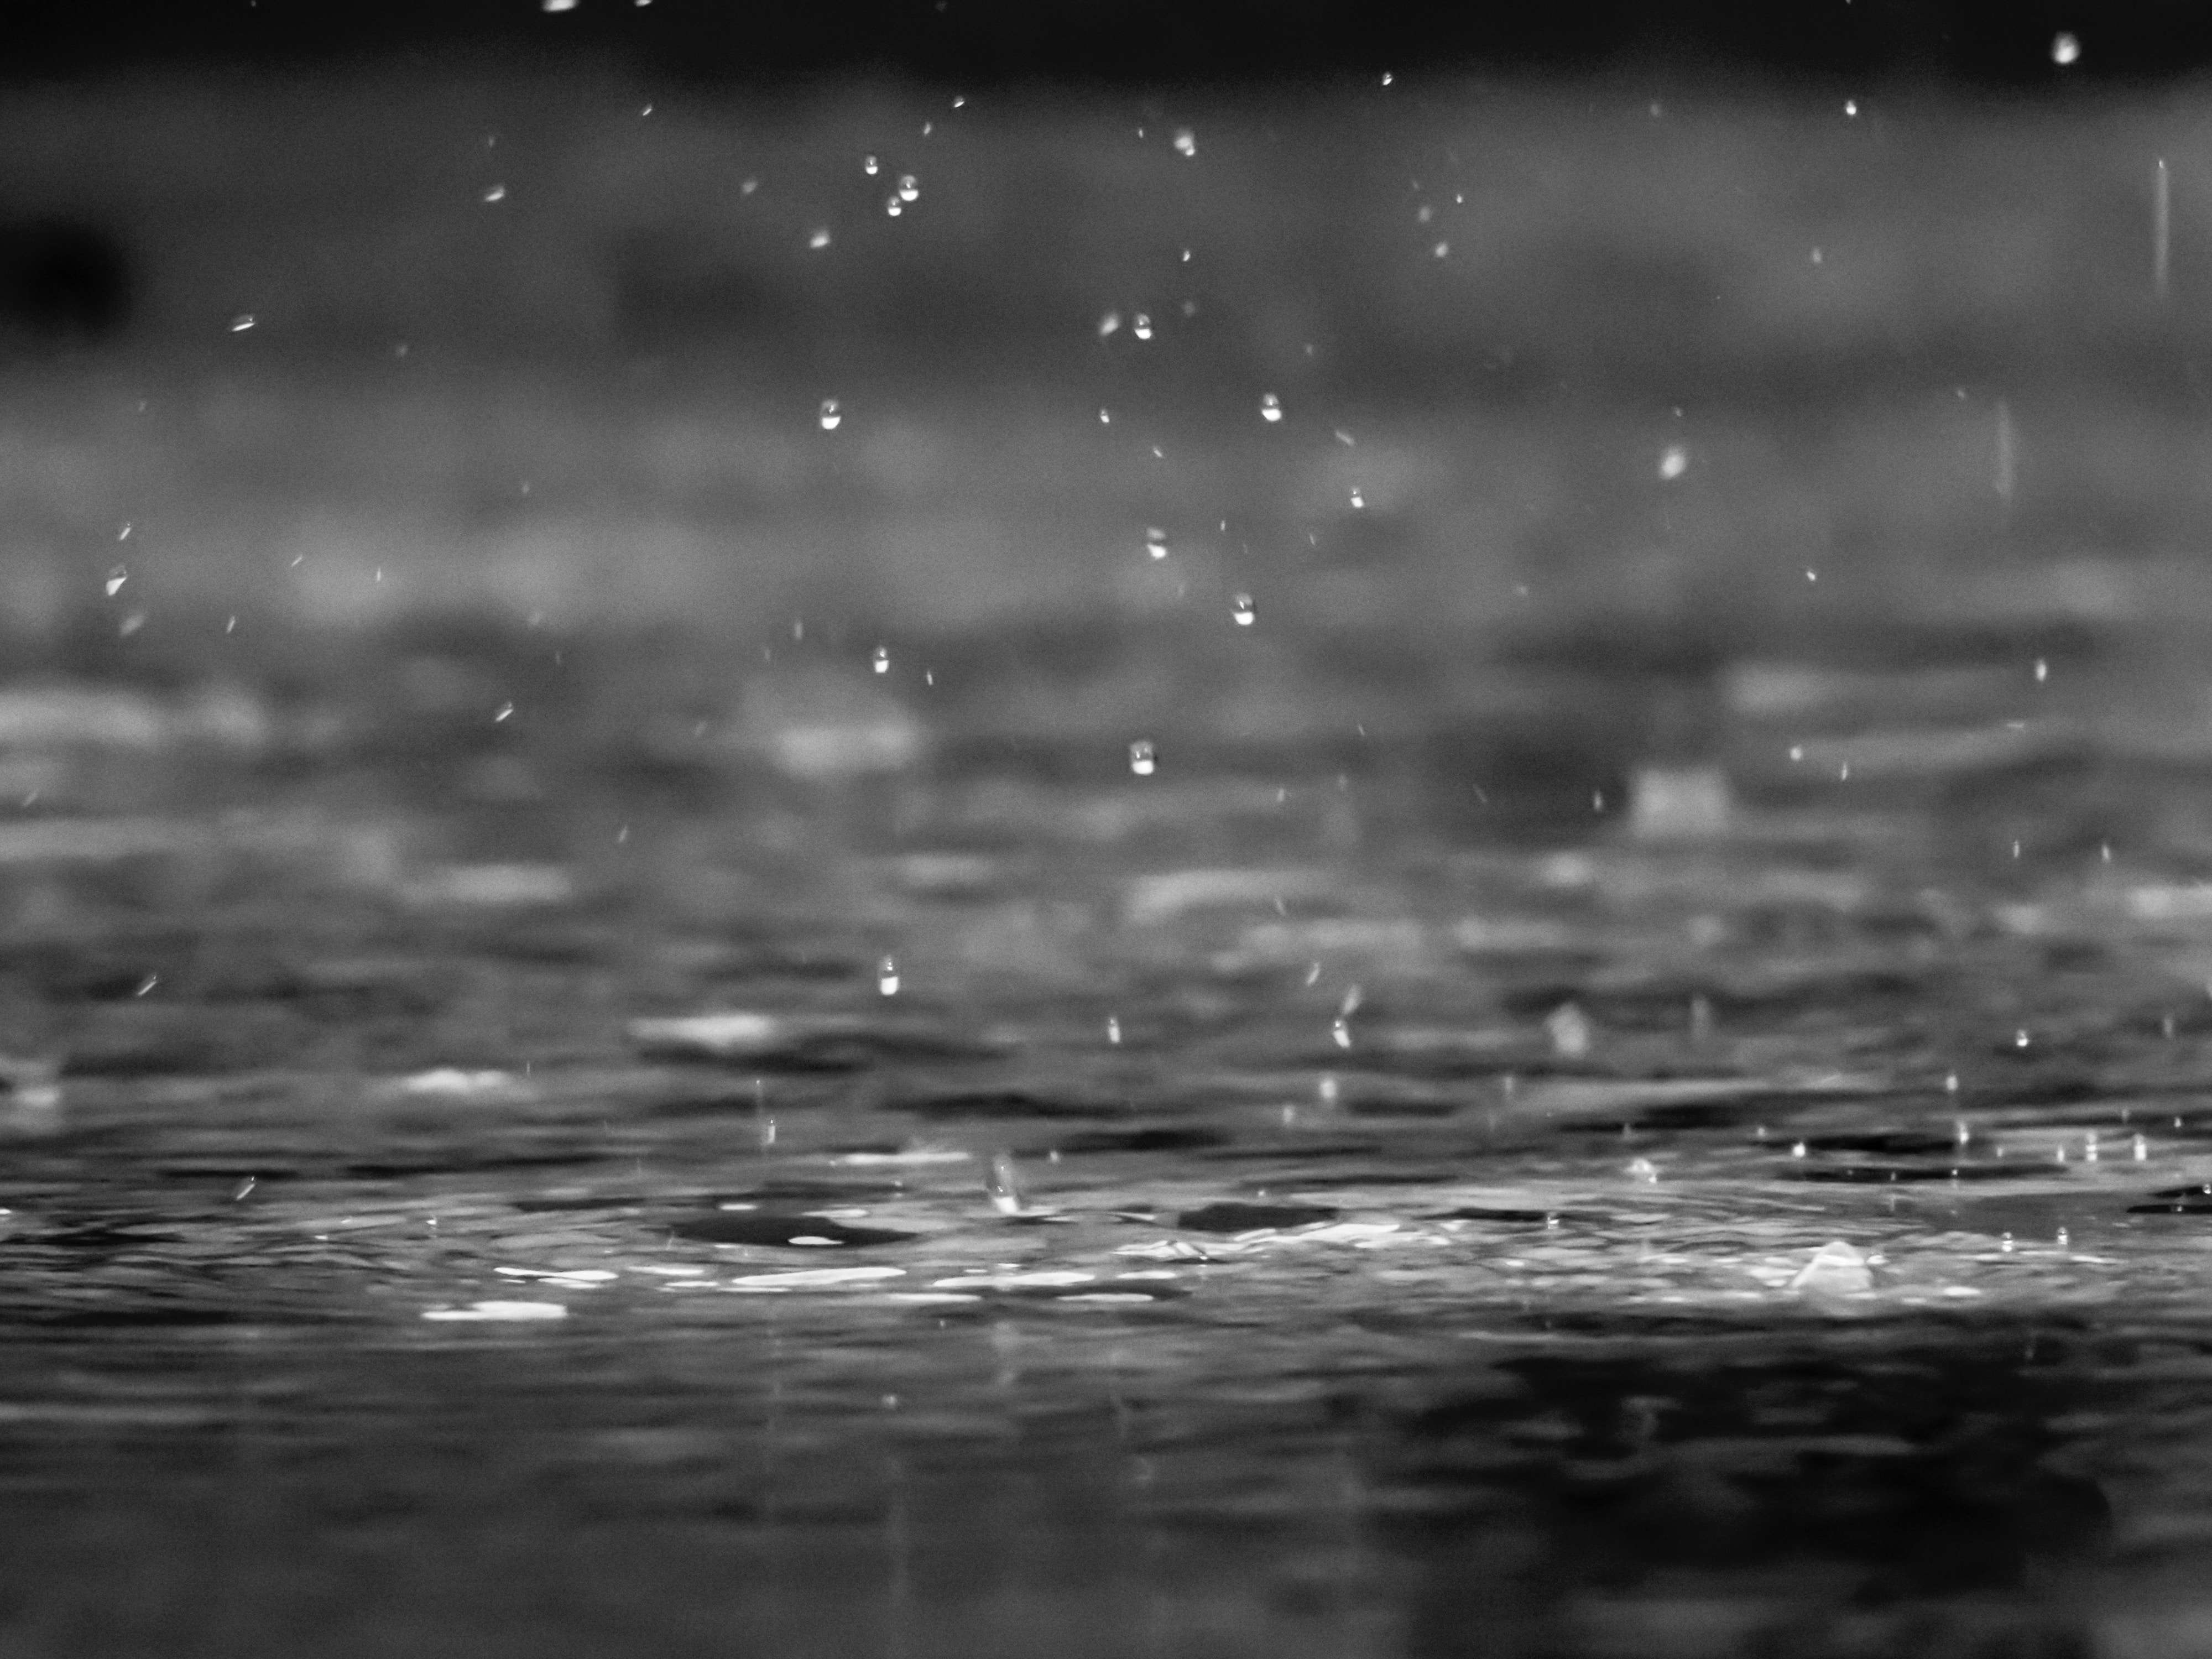 rain splash thee down